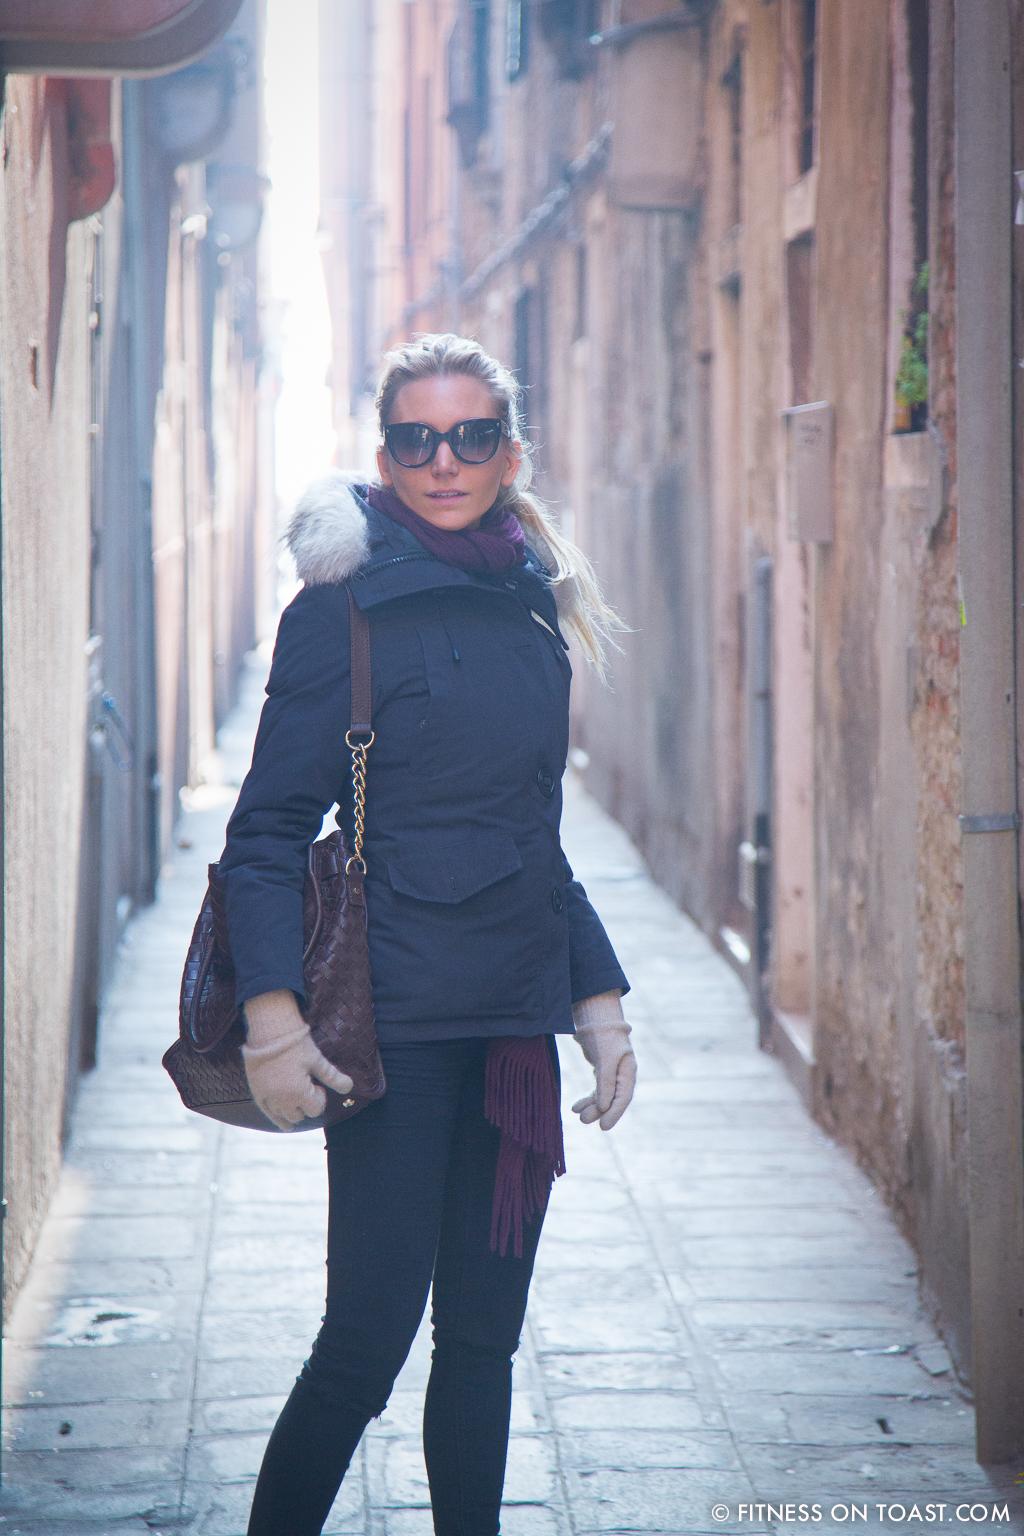 Fitness On Toast Faya Blog Girl Healthy Travel Active Escape Recipe Workout Luxury Venice Hotel Danieli-7